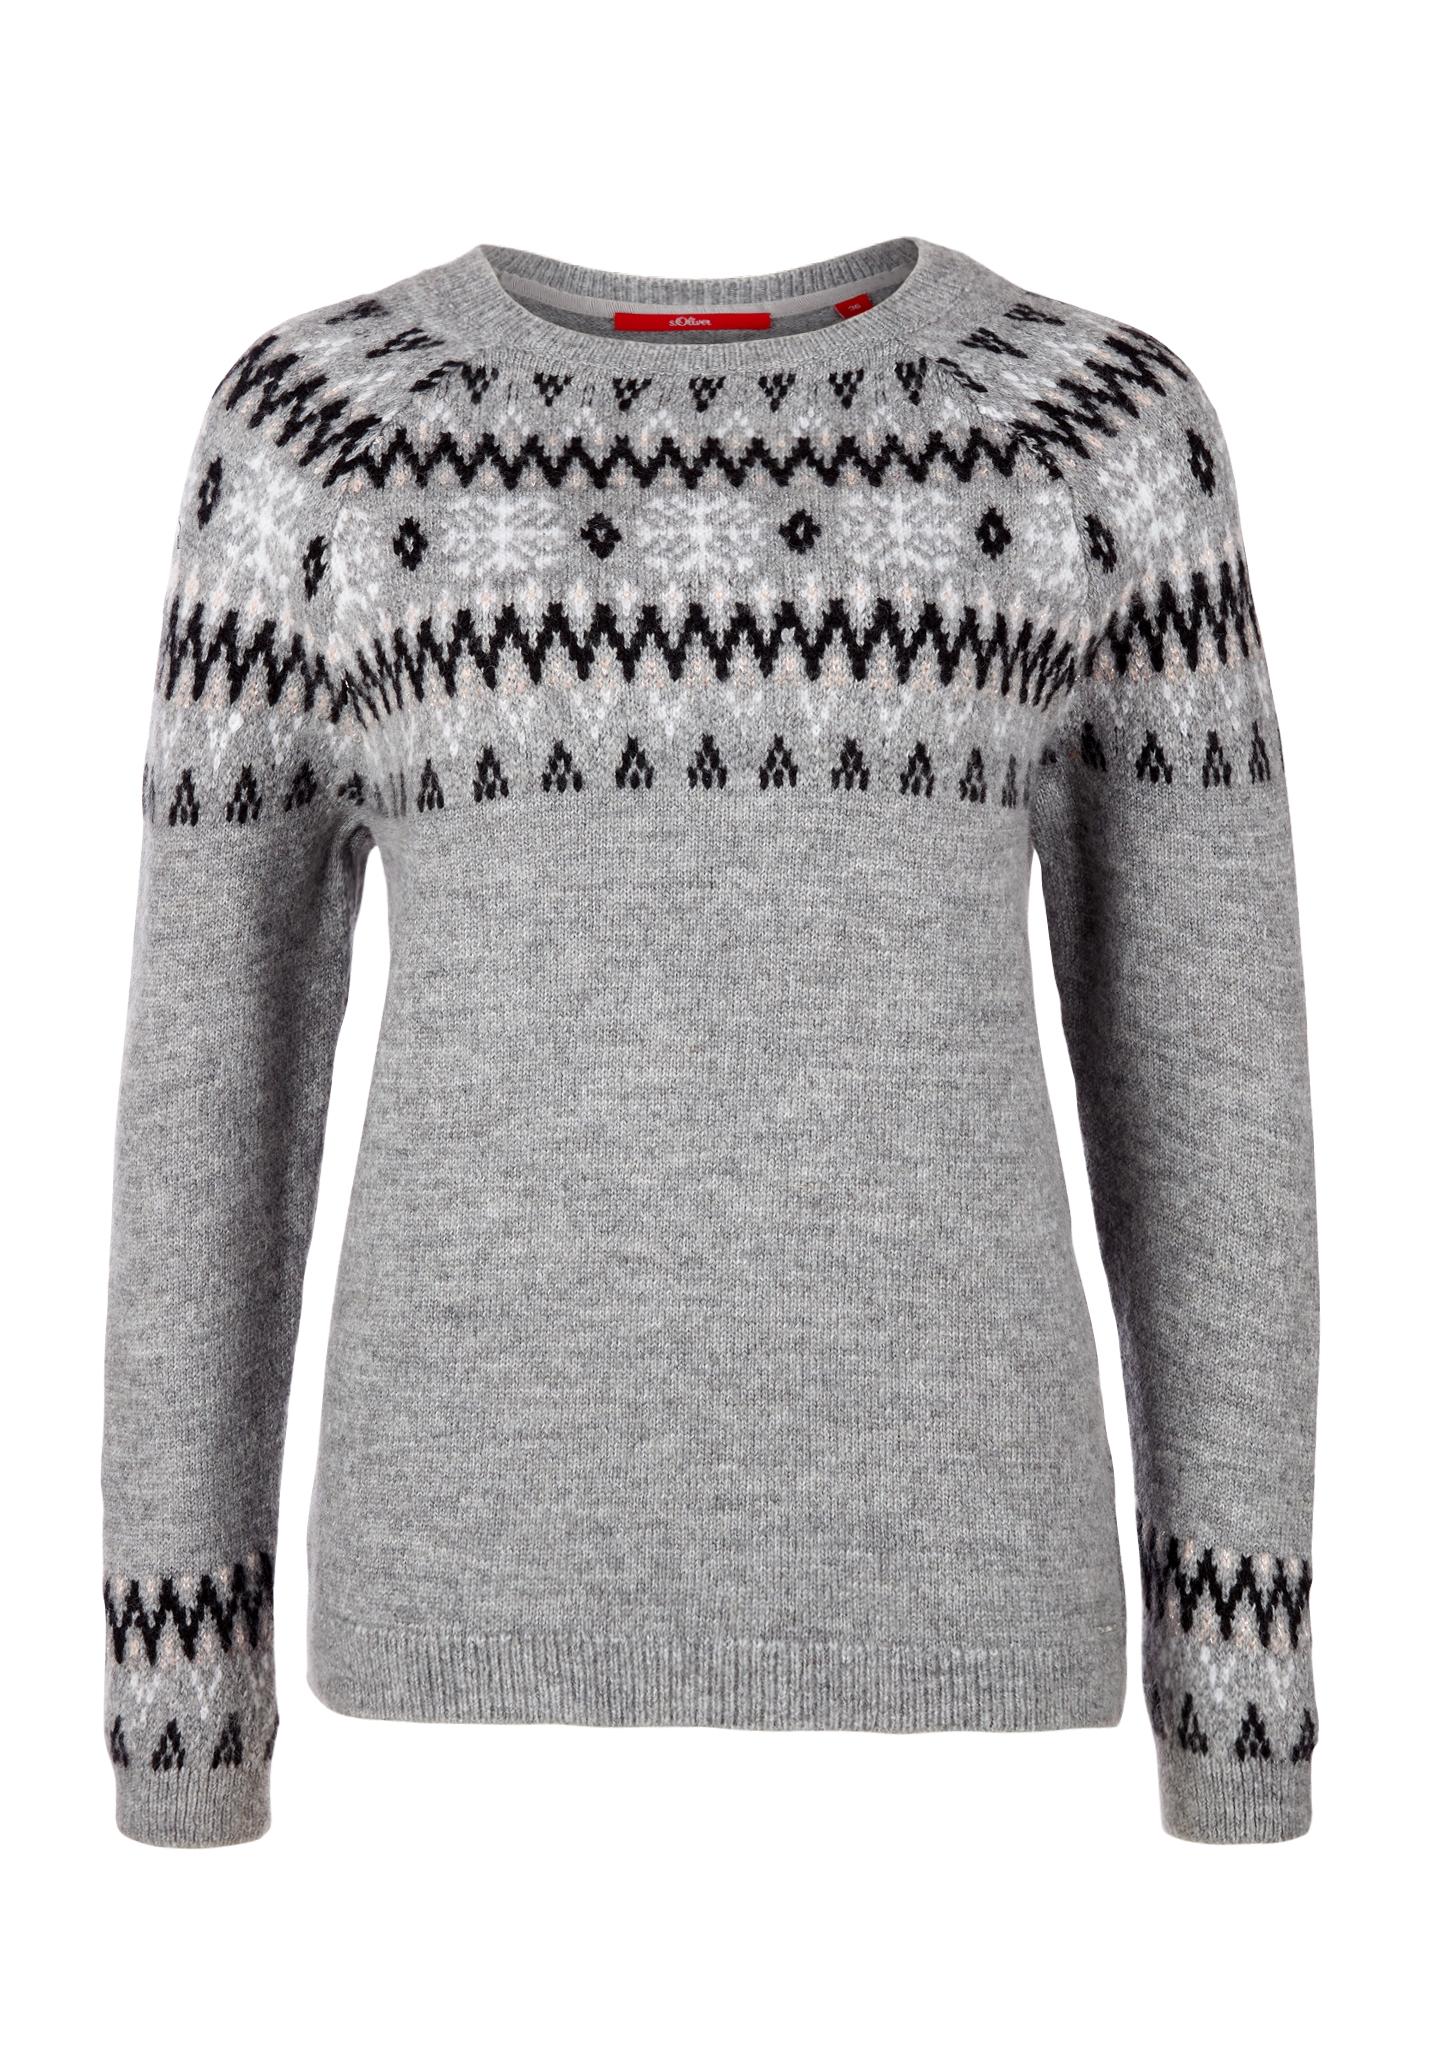 Norweger-Pullover | Bekleidung > Pullover > Norwegerpullover | Grau | 66% polyacryl -  27% polyester -  7% wolle | s.Oliver